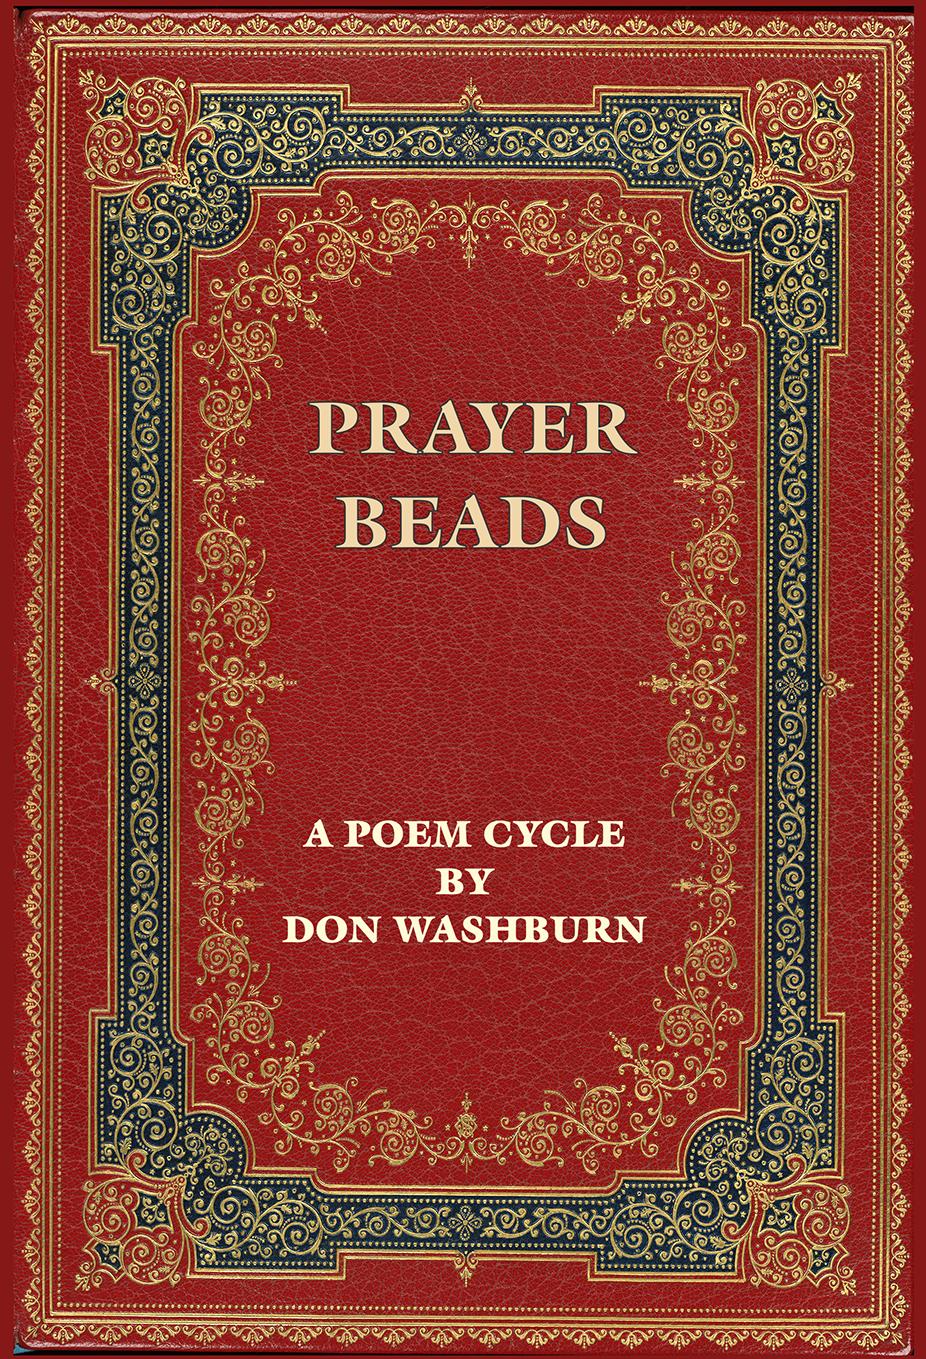 Don Washburn: Prayer Beads (pdf) $300 Buy Ebook Now